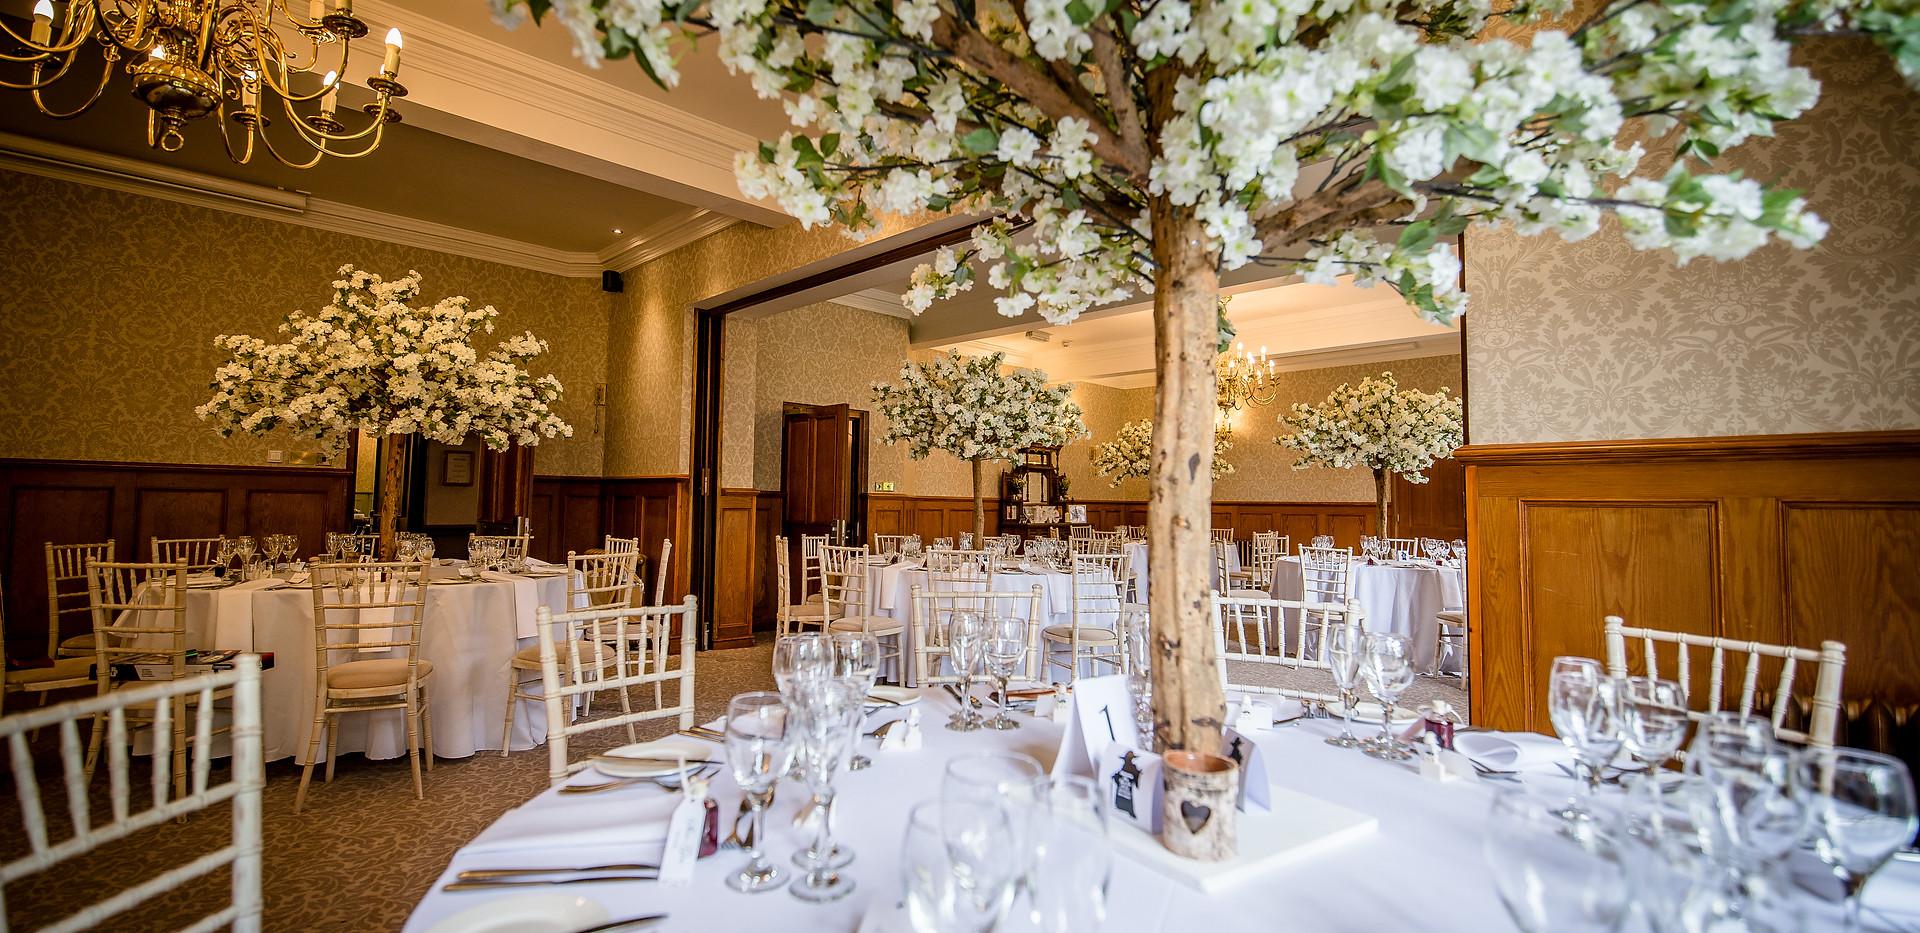 Nunsmere Hall Wedding__6.jpg